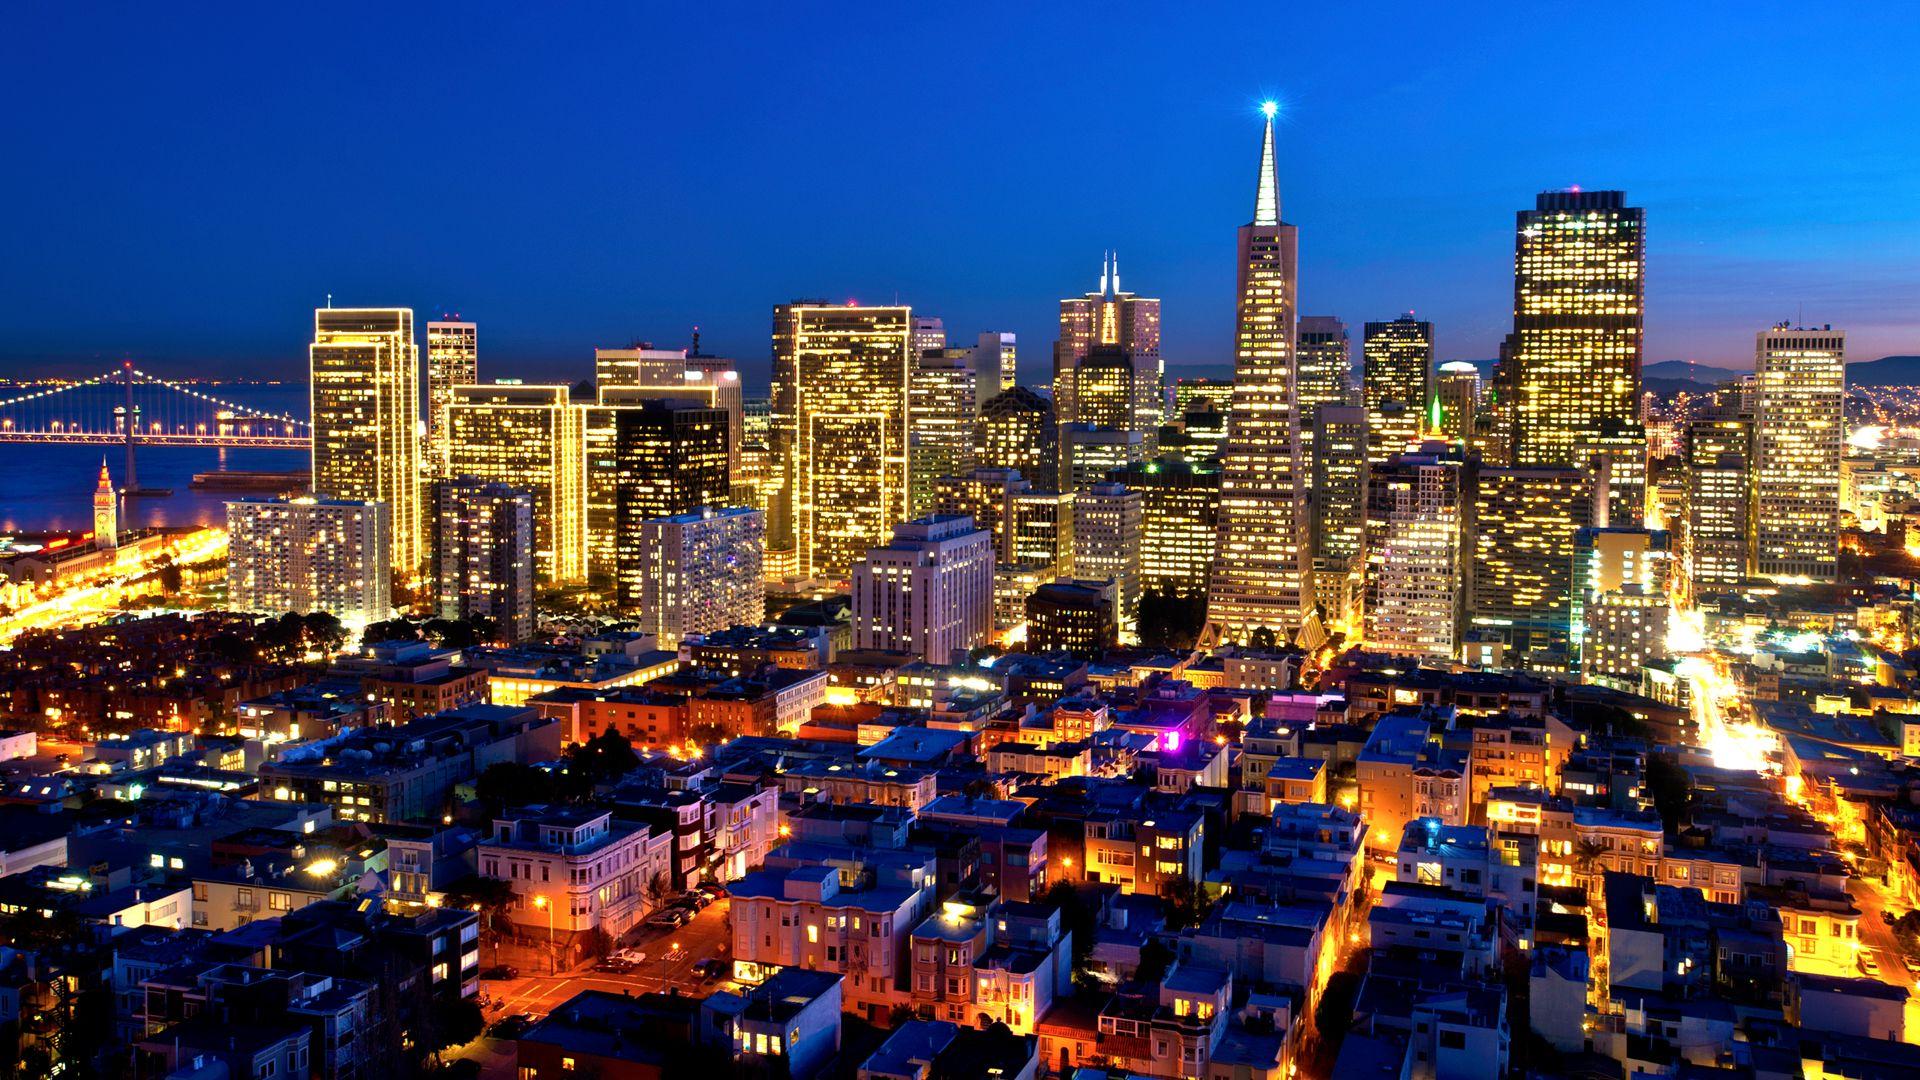 Via Interfacelift Com San Francisco At Night Macbook Pro Wallpaper New York Wallpaper